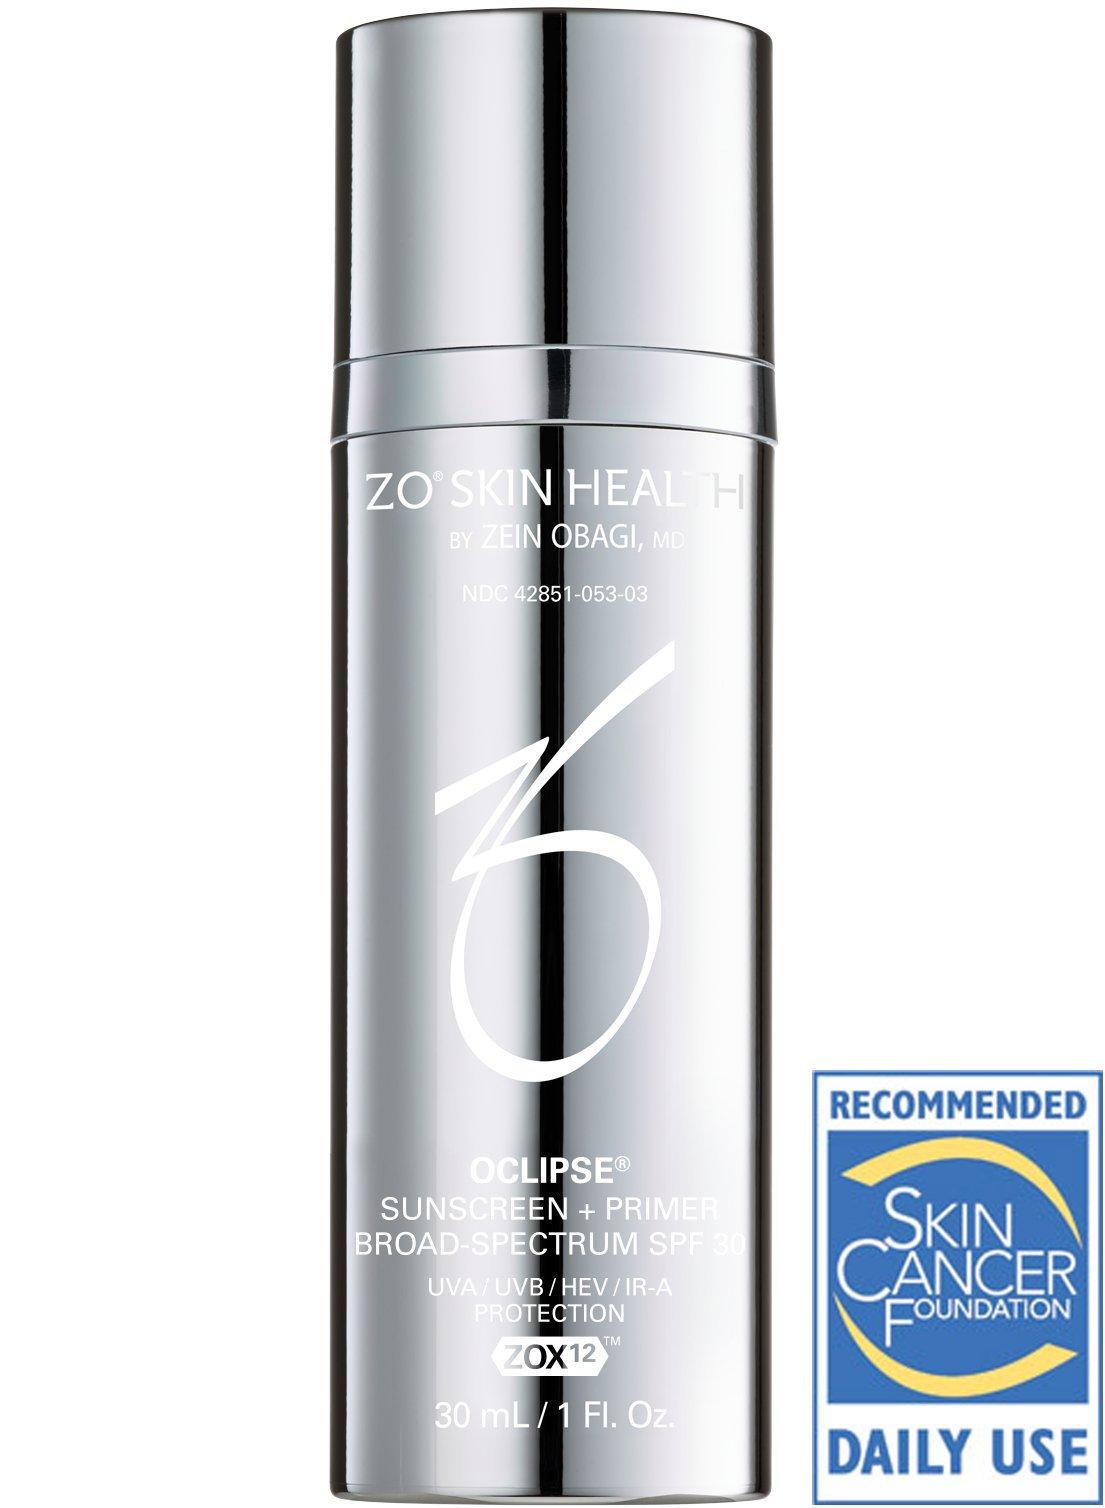 ZO Skin Health Oclipse Sunscreen Primer SPF 30 - 1oz/30ml by ZO Skin Health